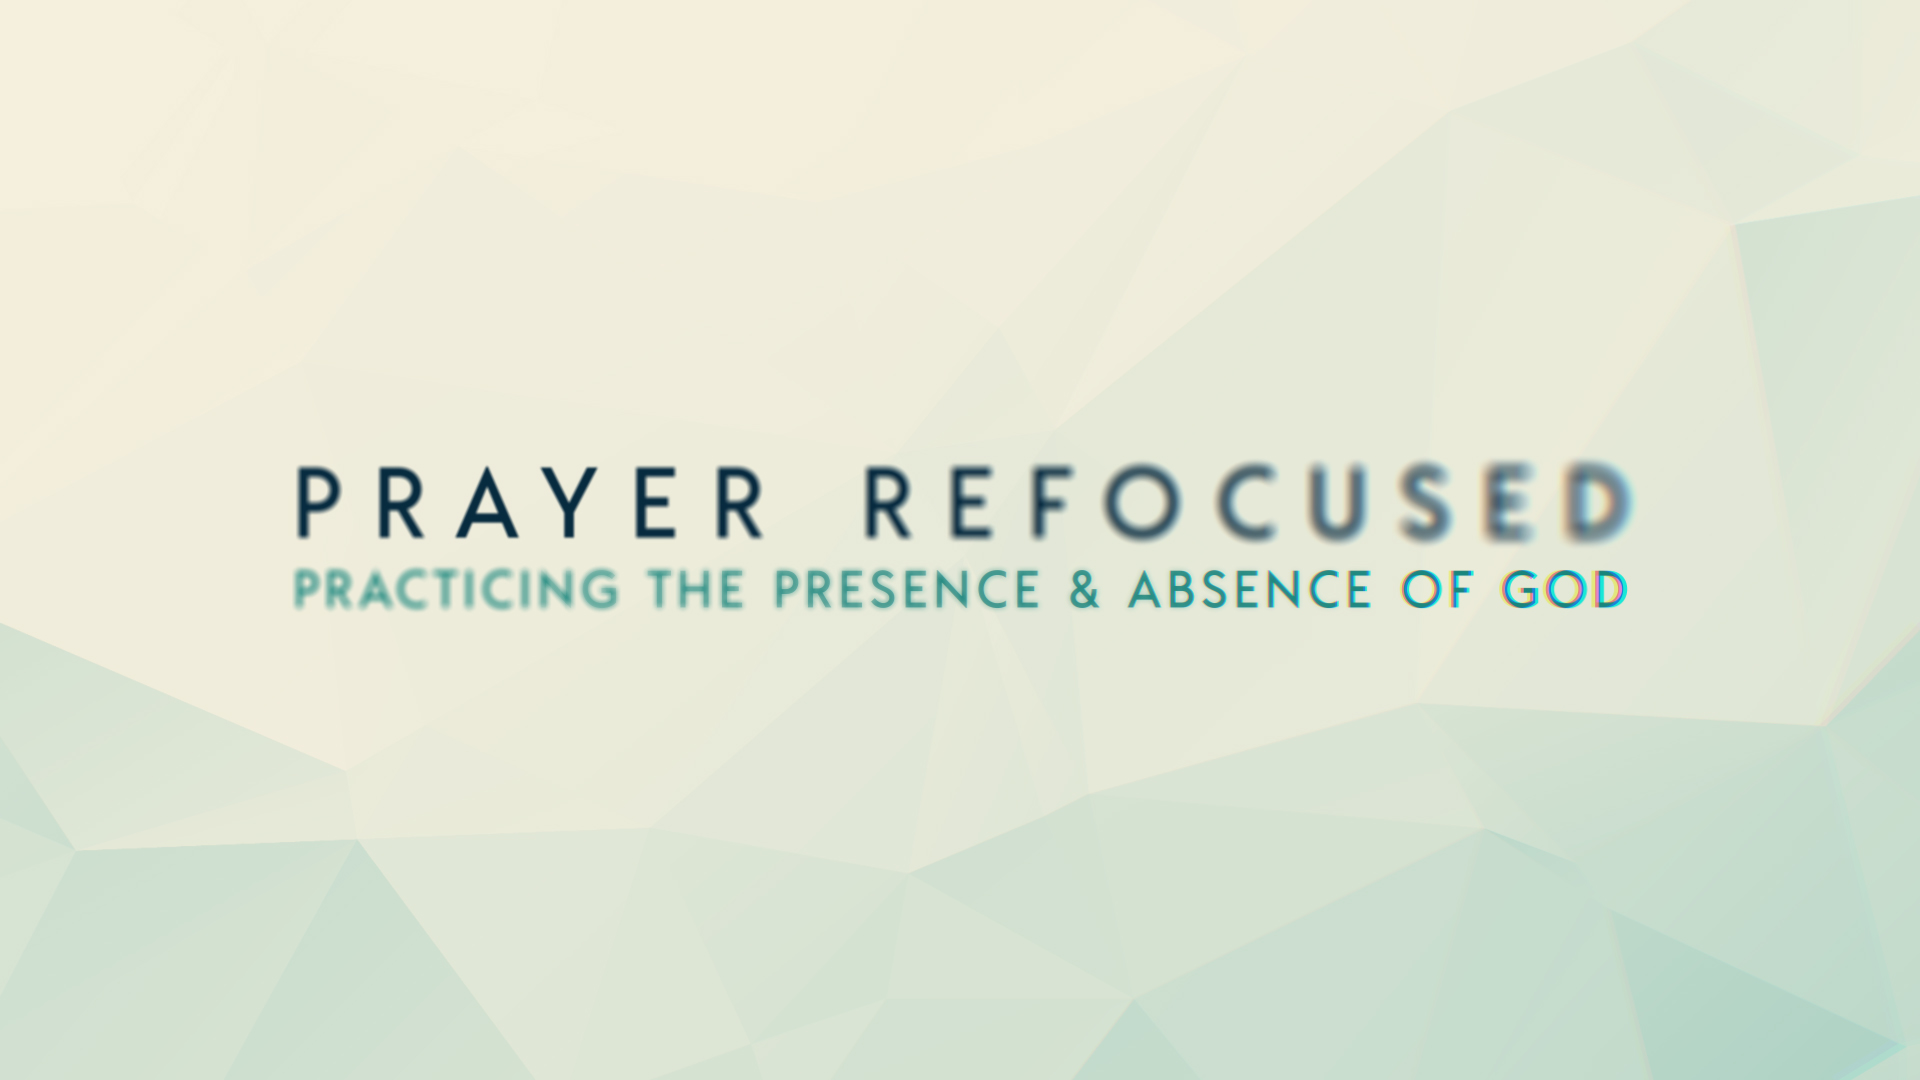 Prayer refocused v2  1